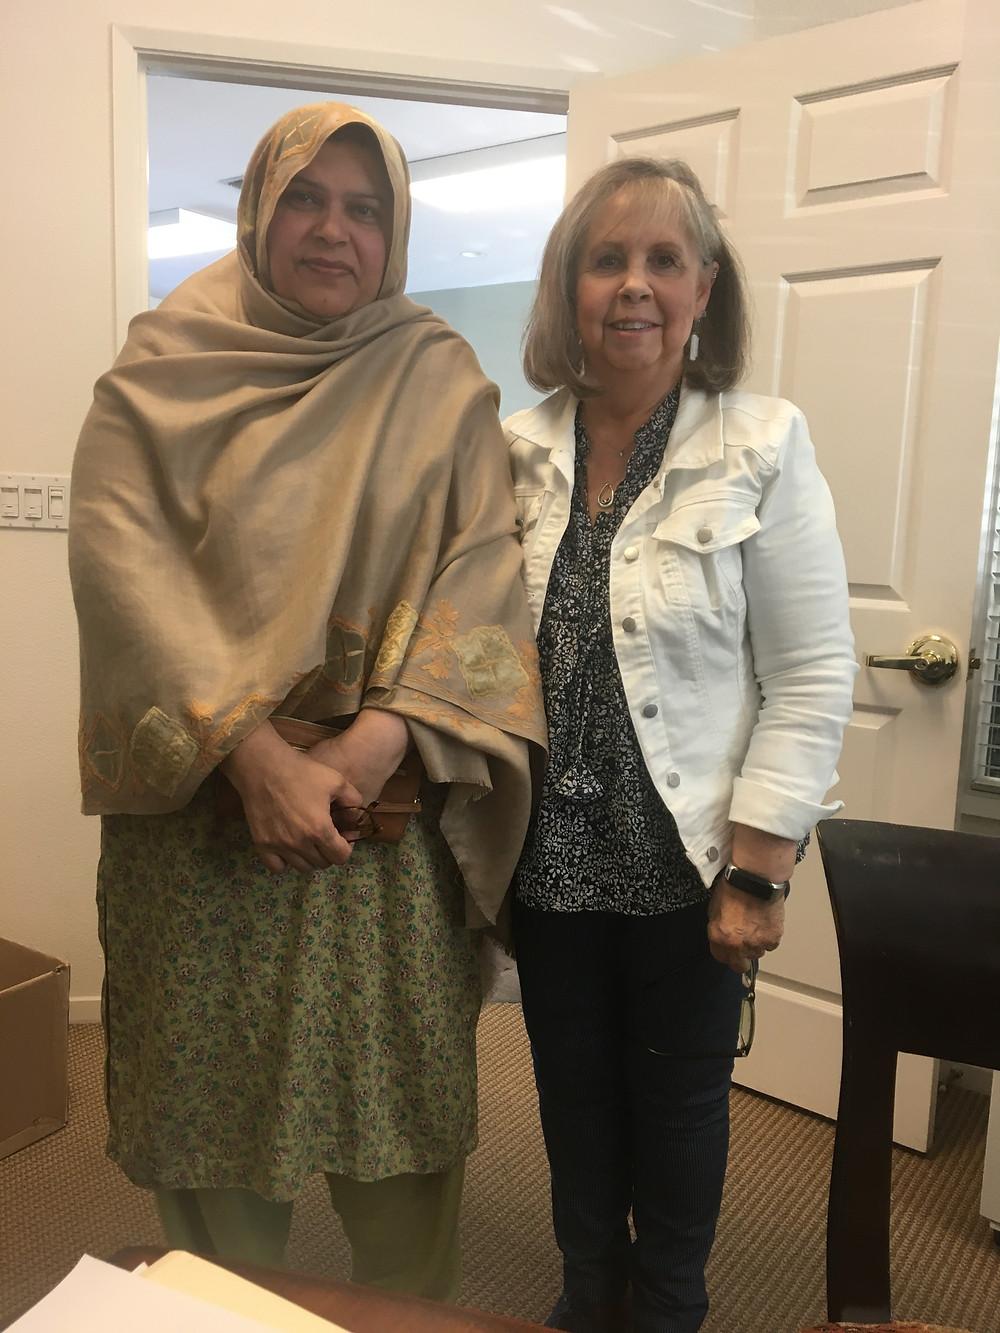 Judi Boston-shedd with Willow Glen resident Shabnim Kahn